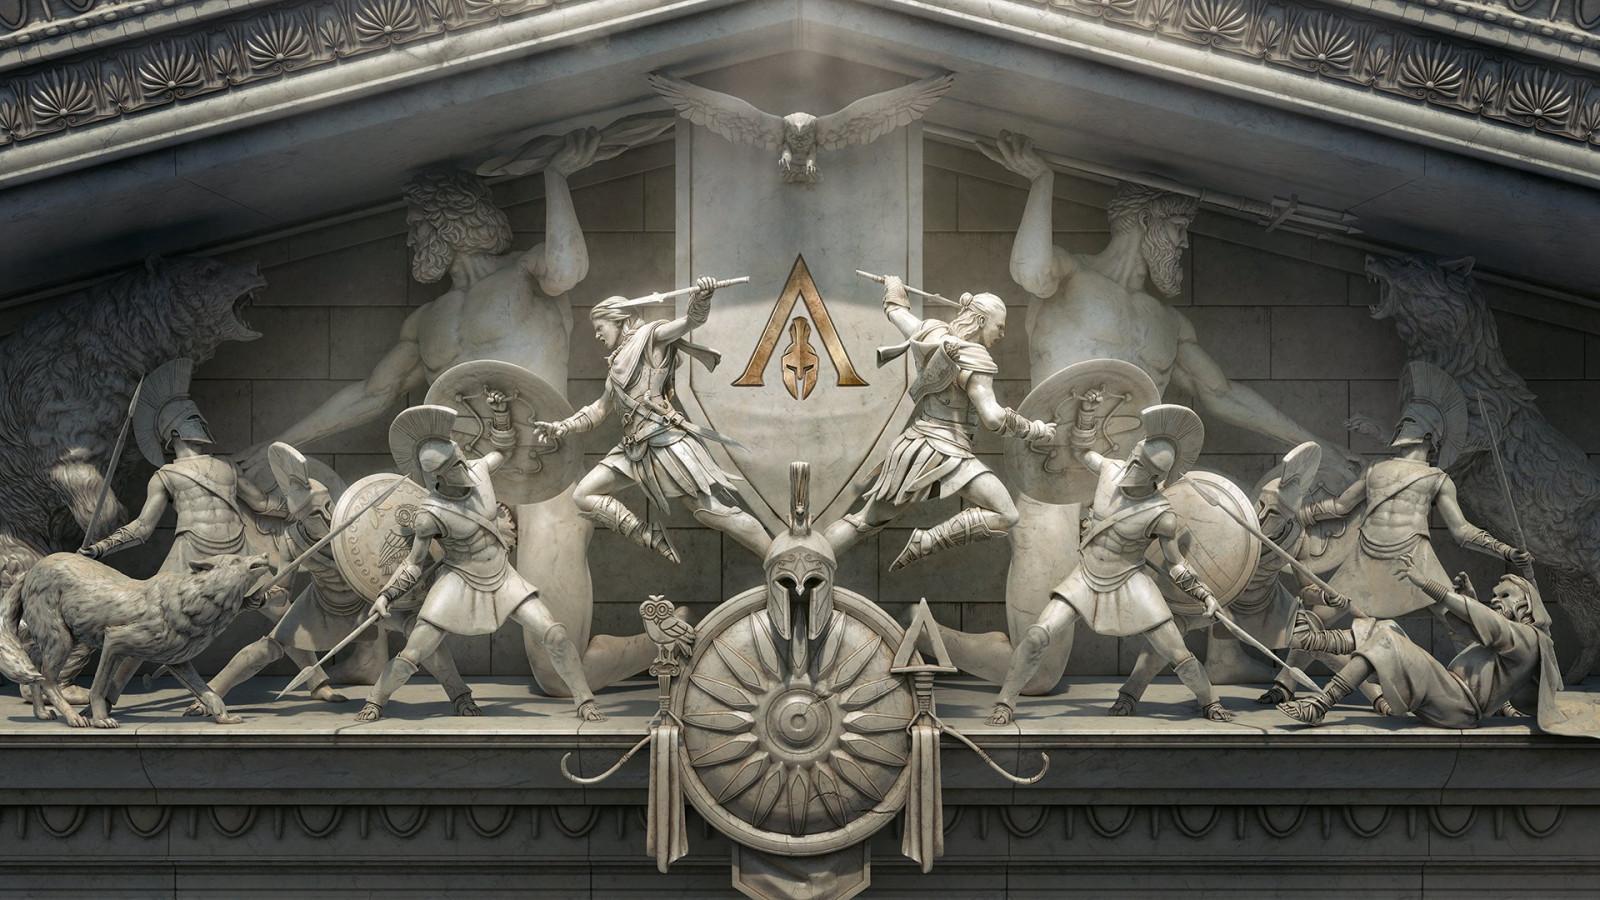 Wallpaper : Assassin's Creed, Assassin's Creed Odyssey ...